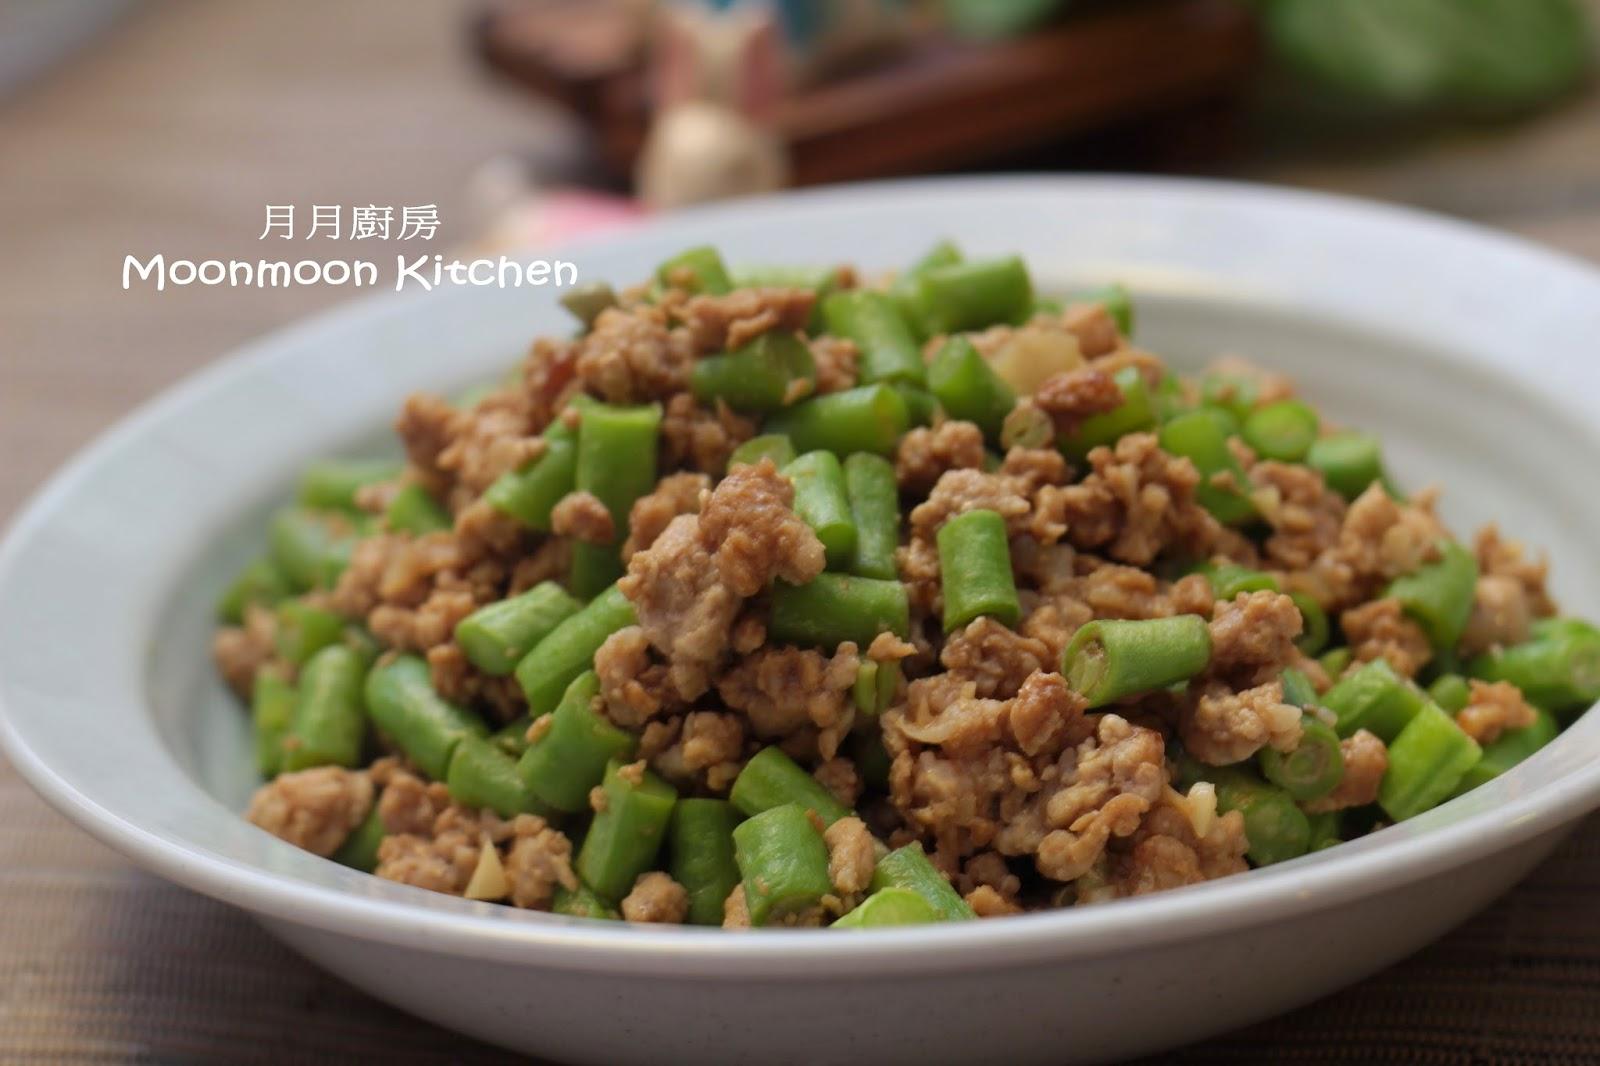 Sandy Mama @ MOONmoon's Kitchen : 食譜~【豆角炒肉碎】